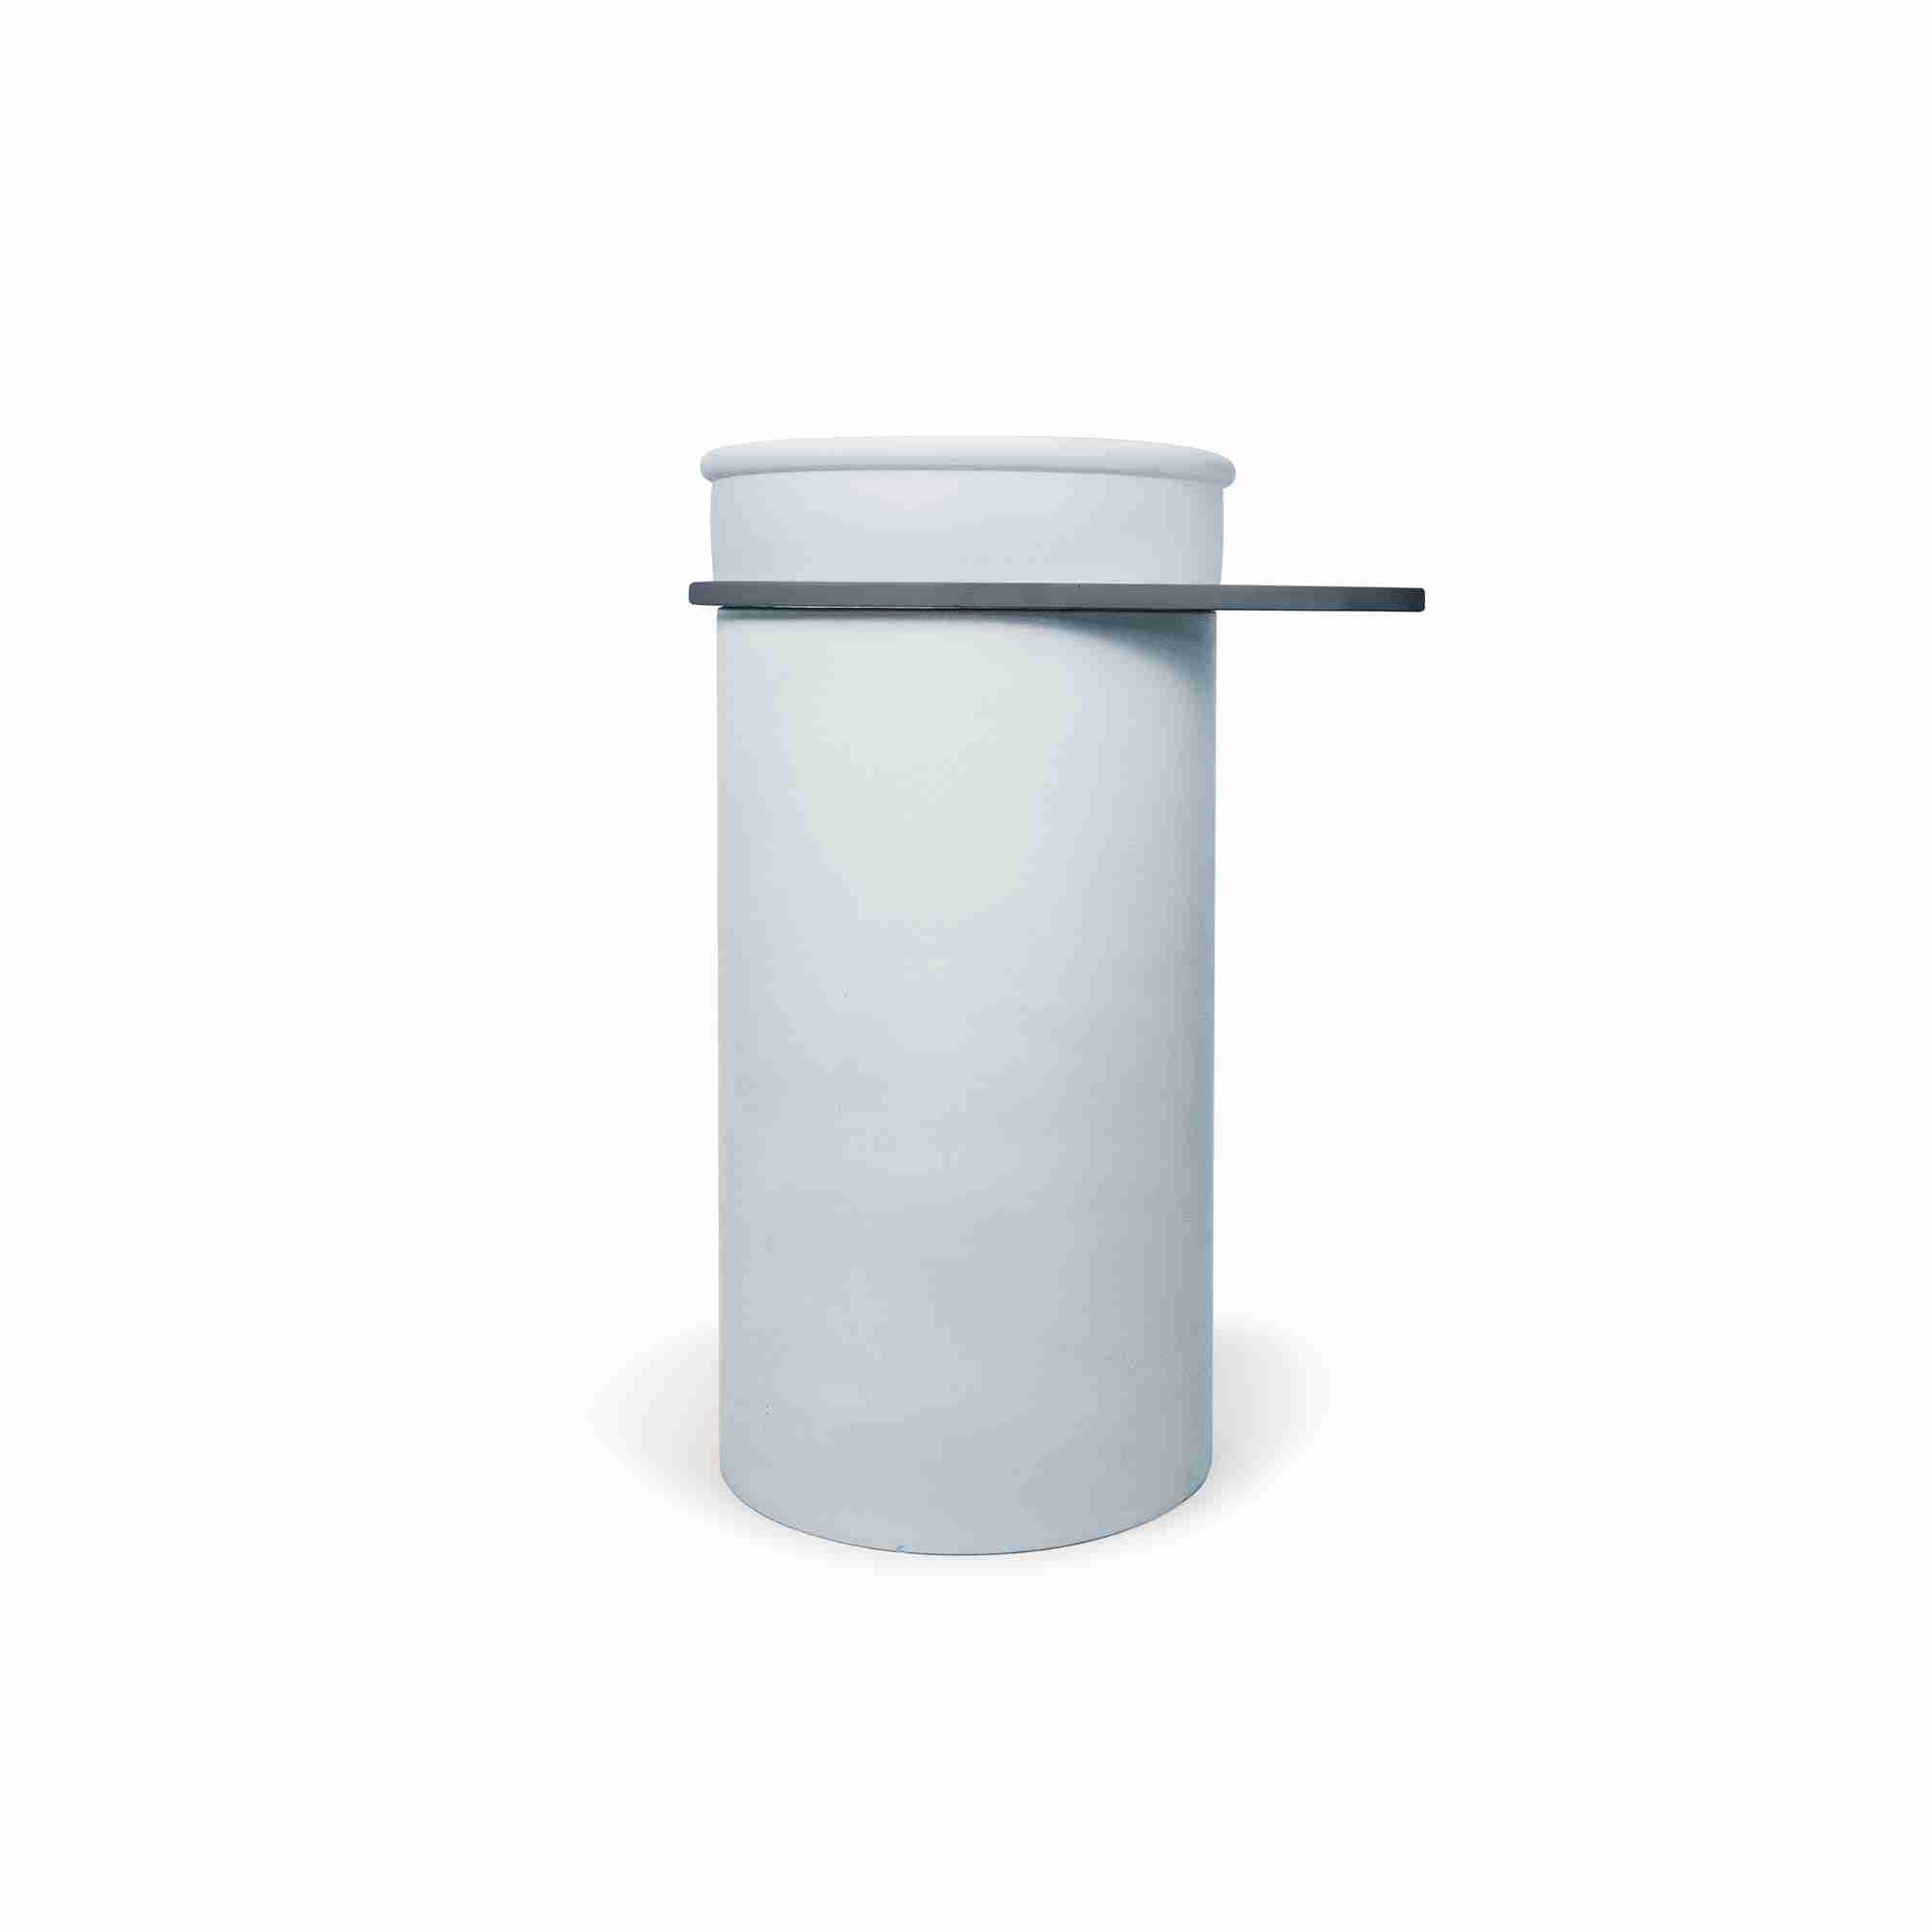 Tubb Basin Cylinder 3